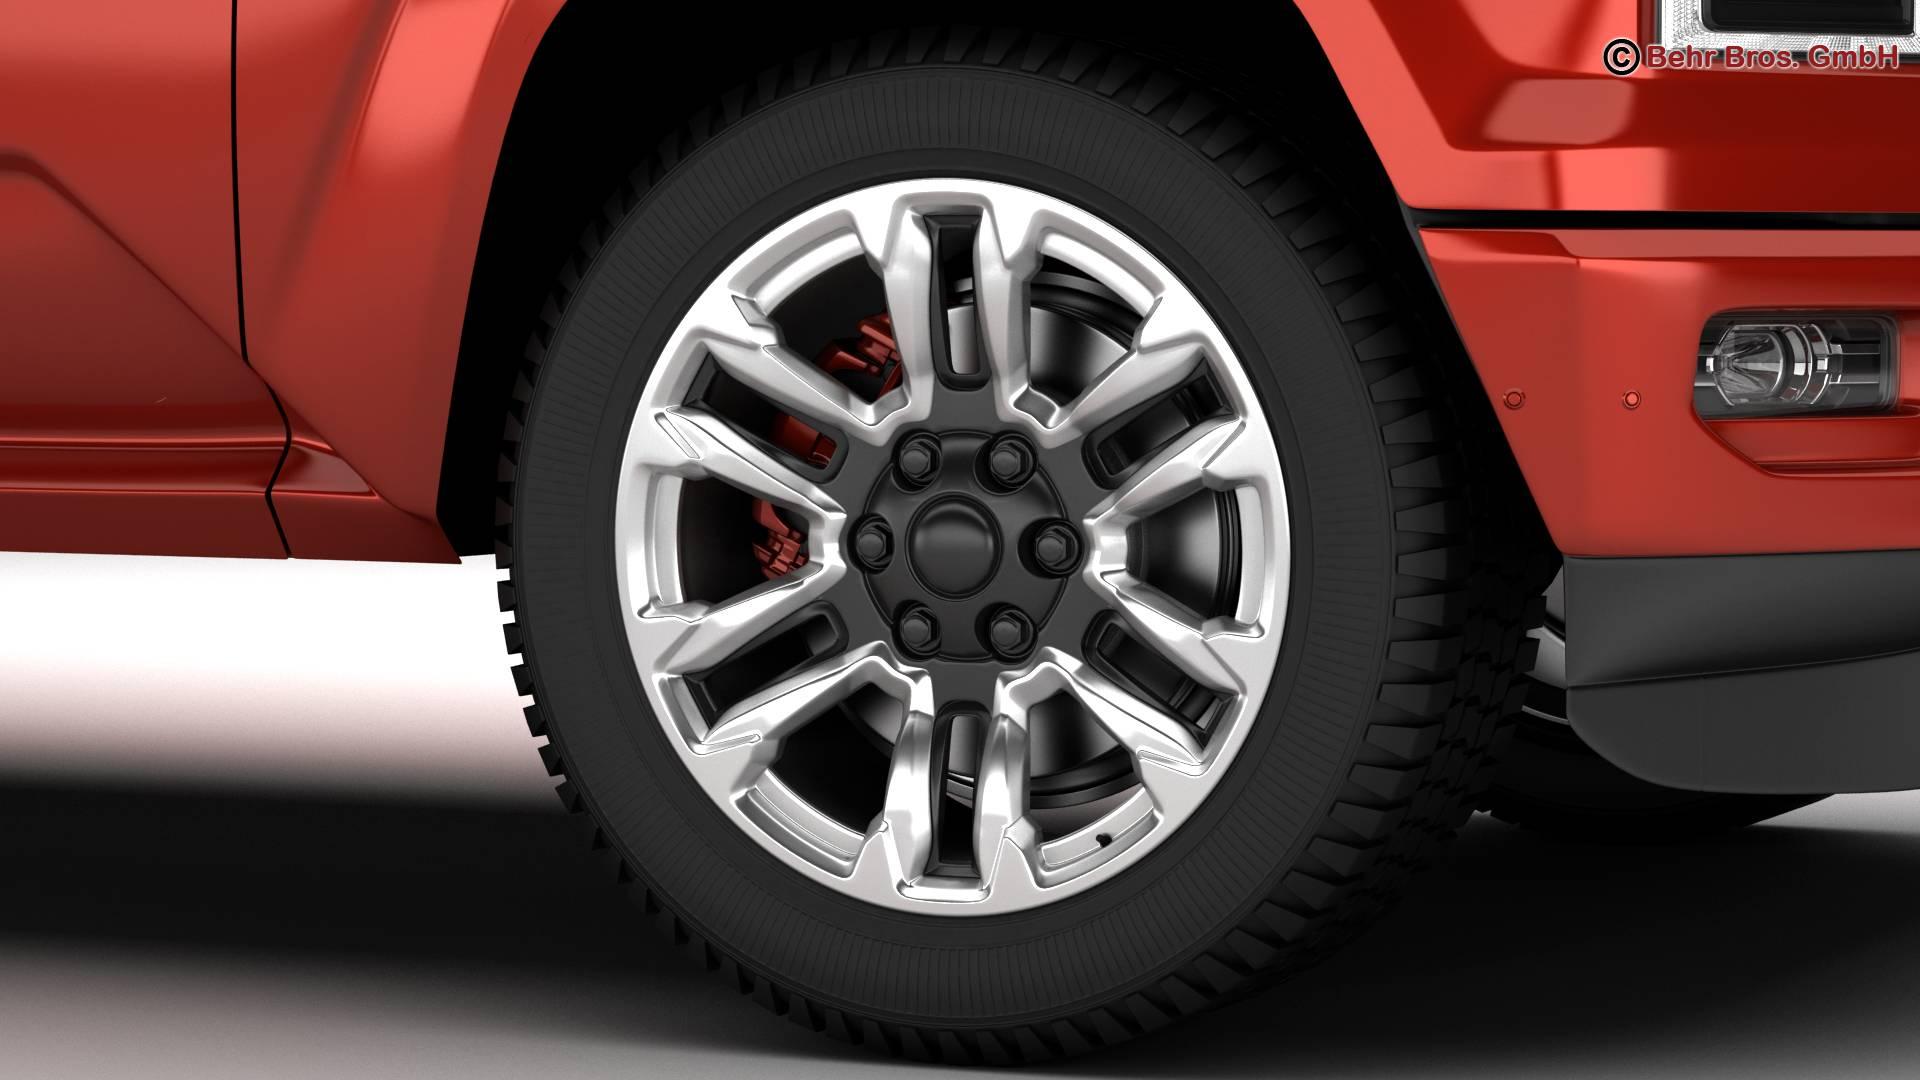 generic pickup 3d model 3ds max fbx c4d lwo ma mb obj 219875